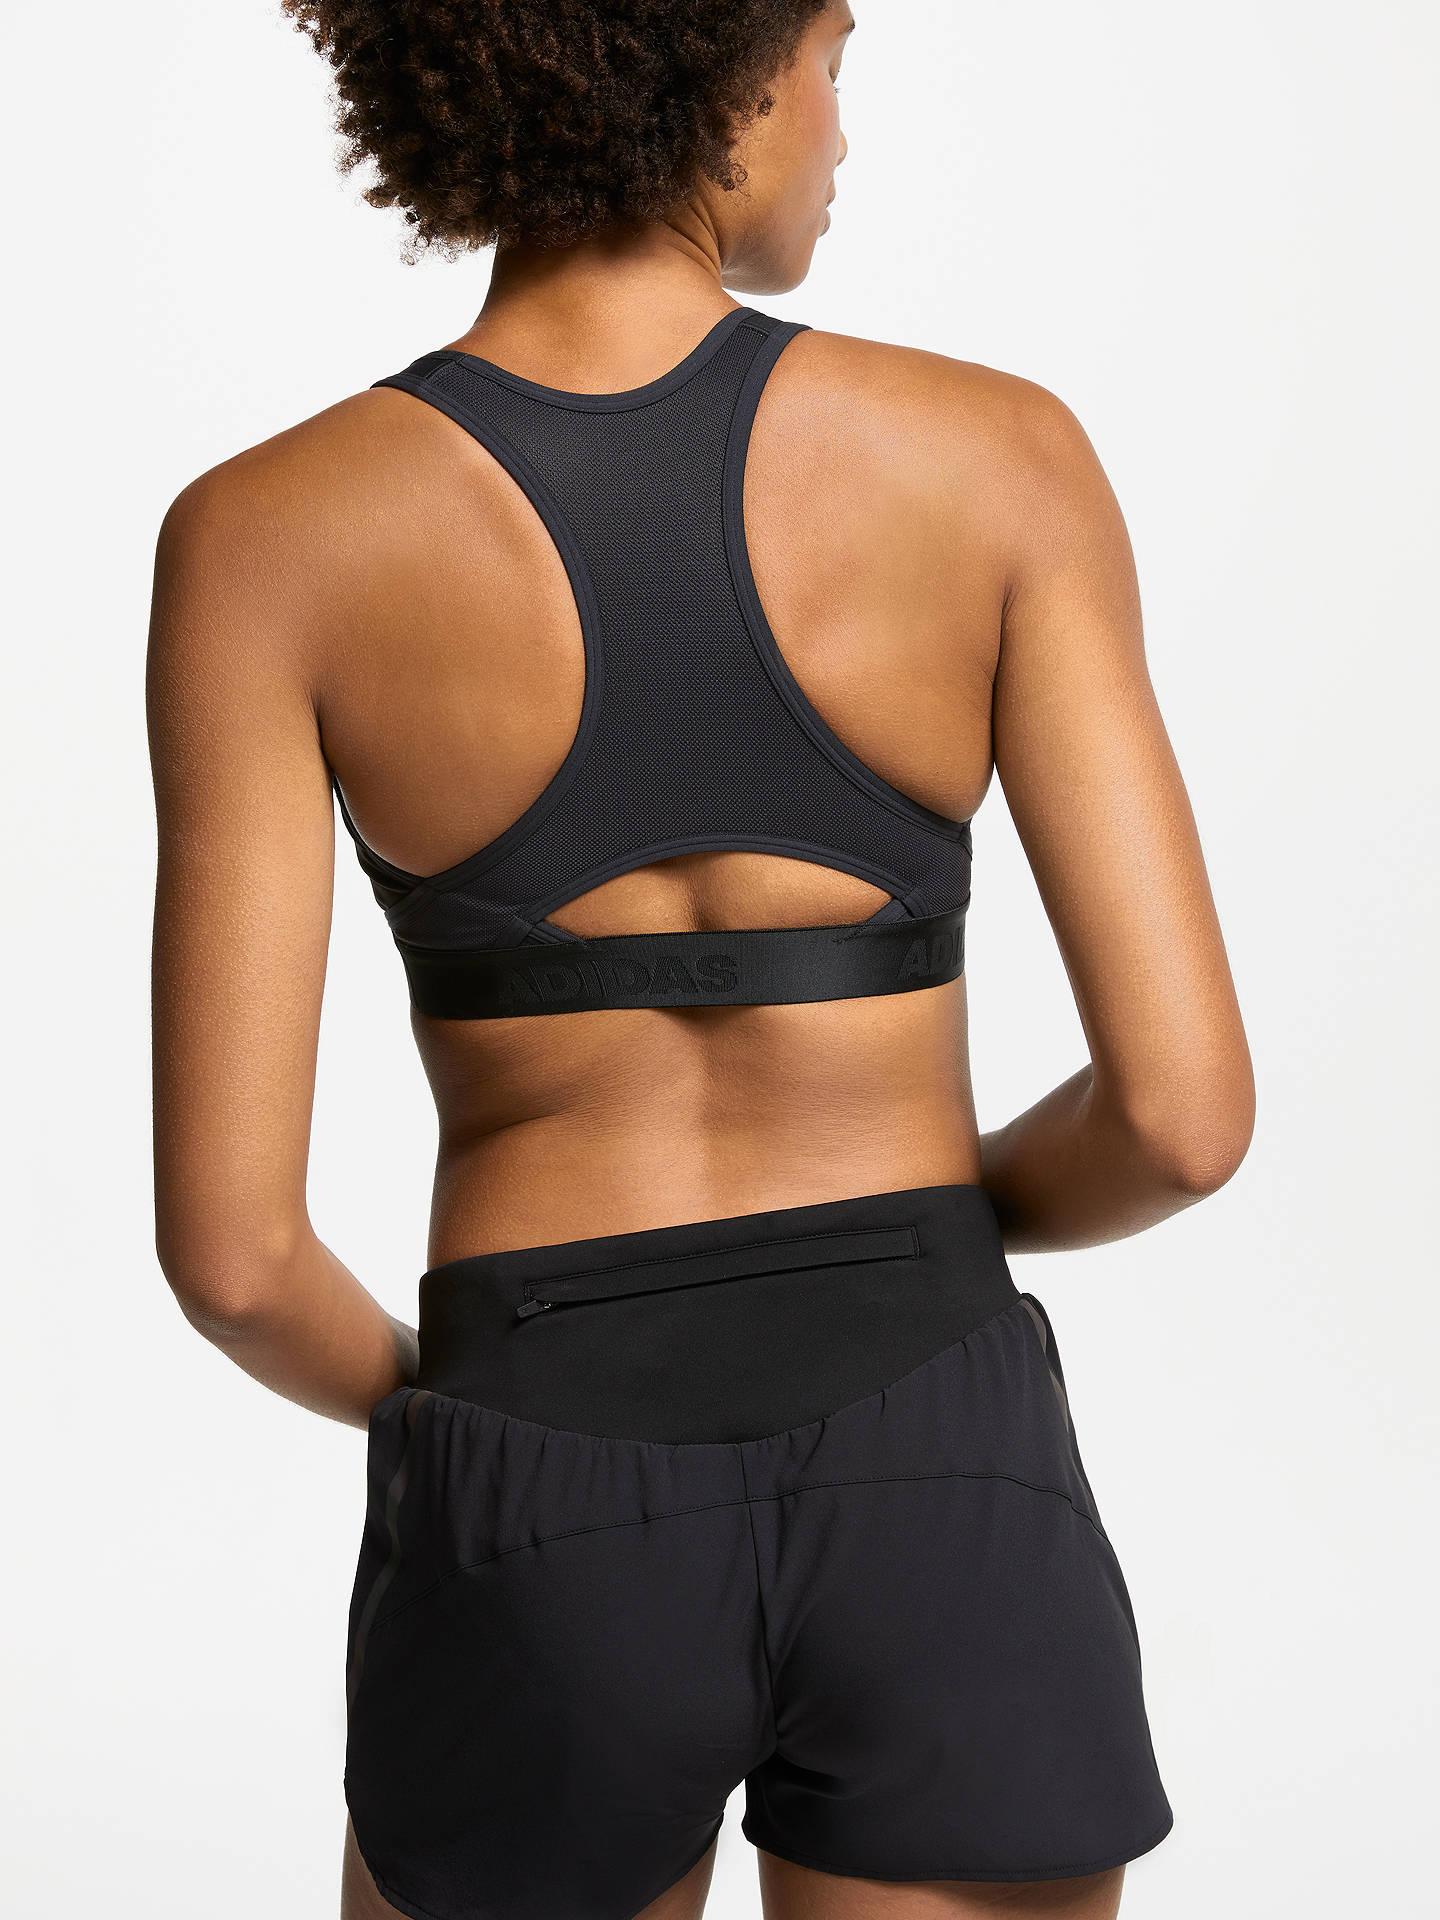 1406279dc36 adidas Don't Rest Alpha Skin Tech Sports Bra, Black